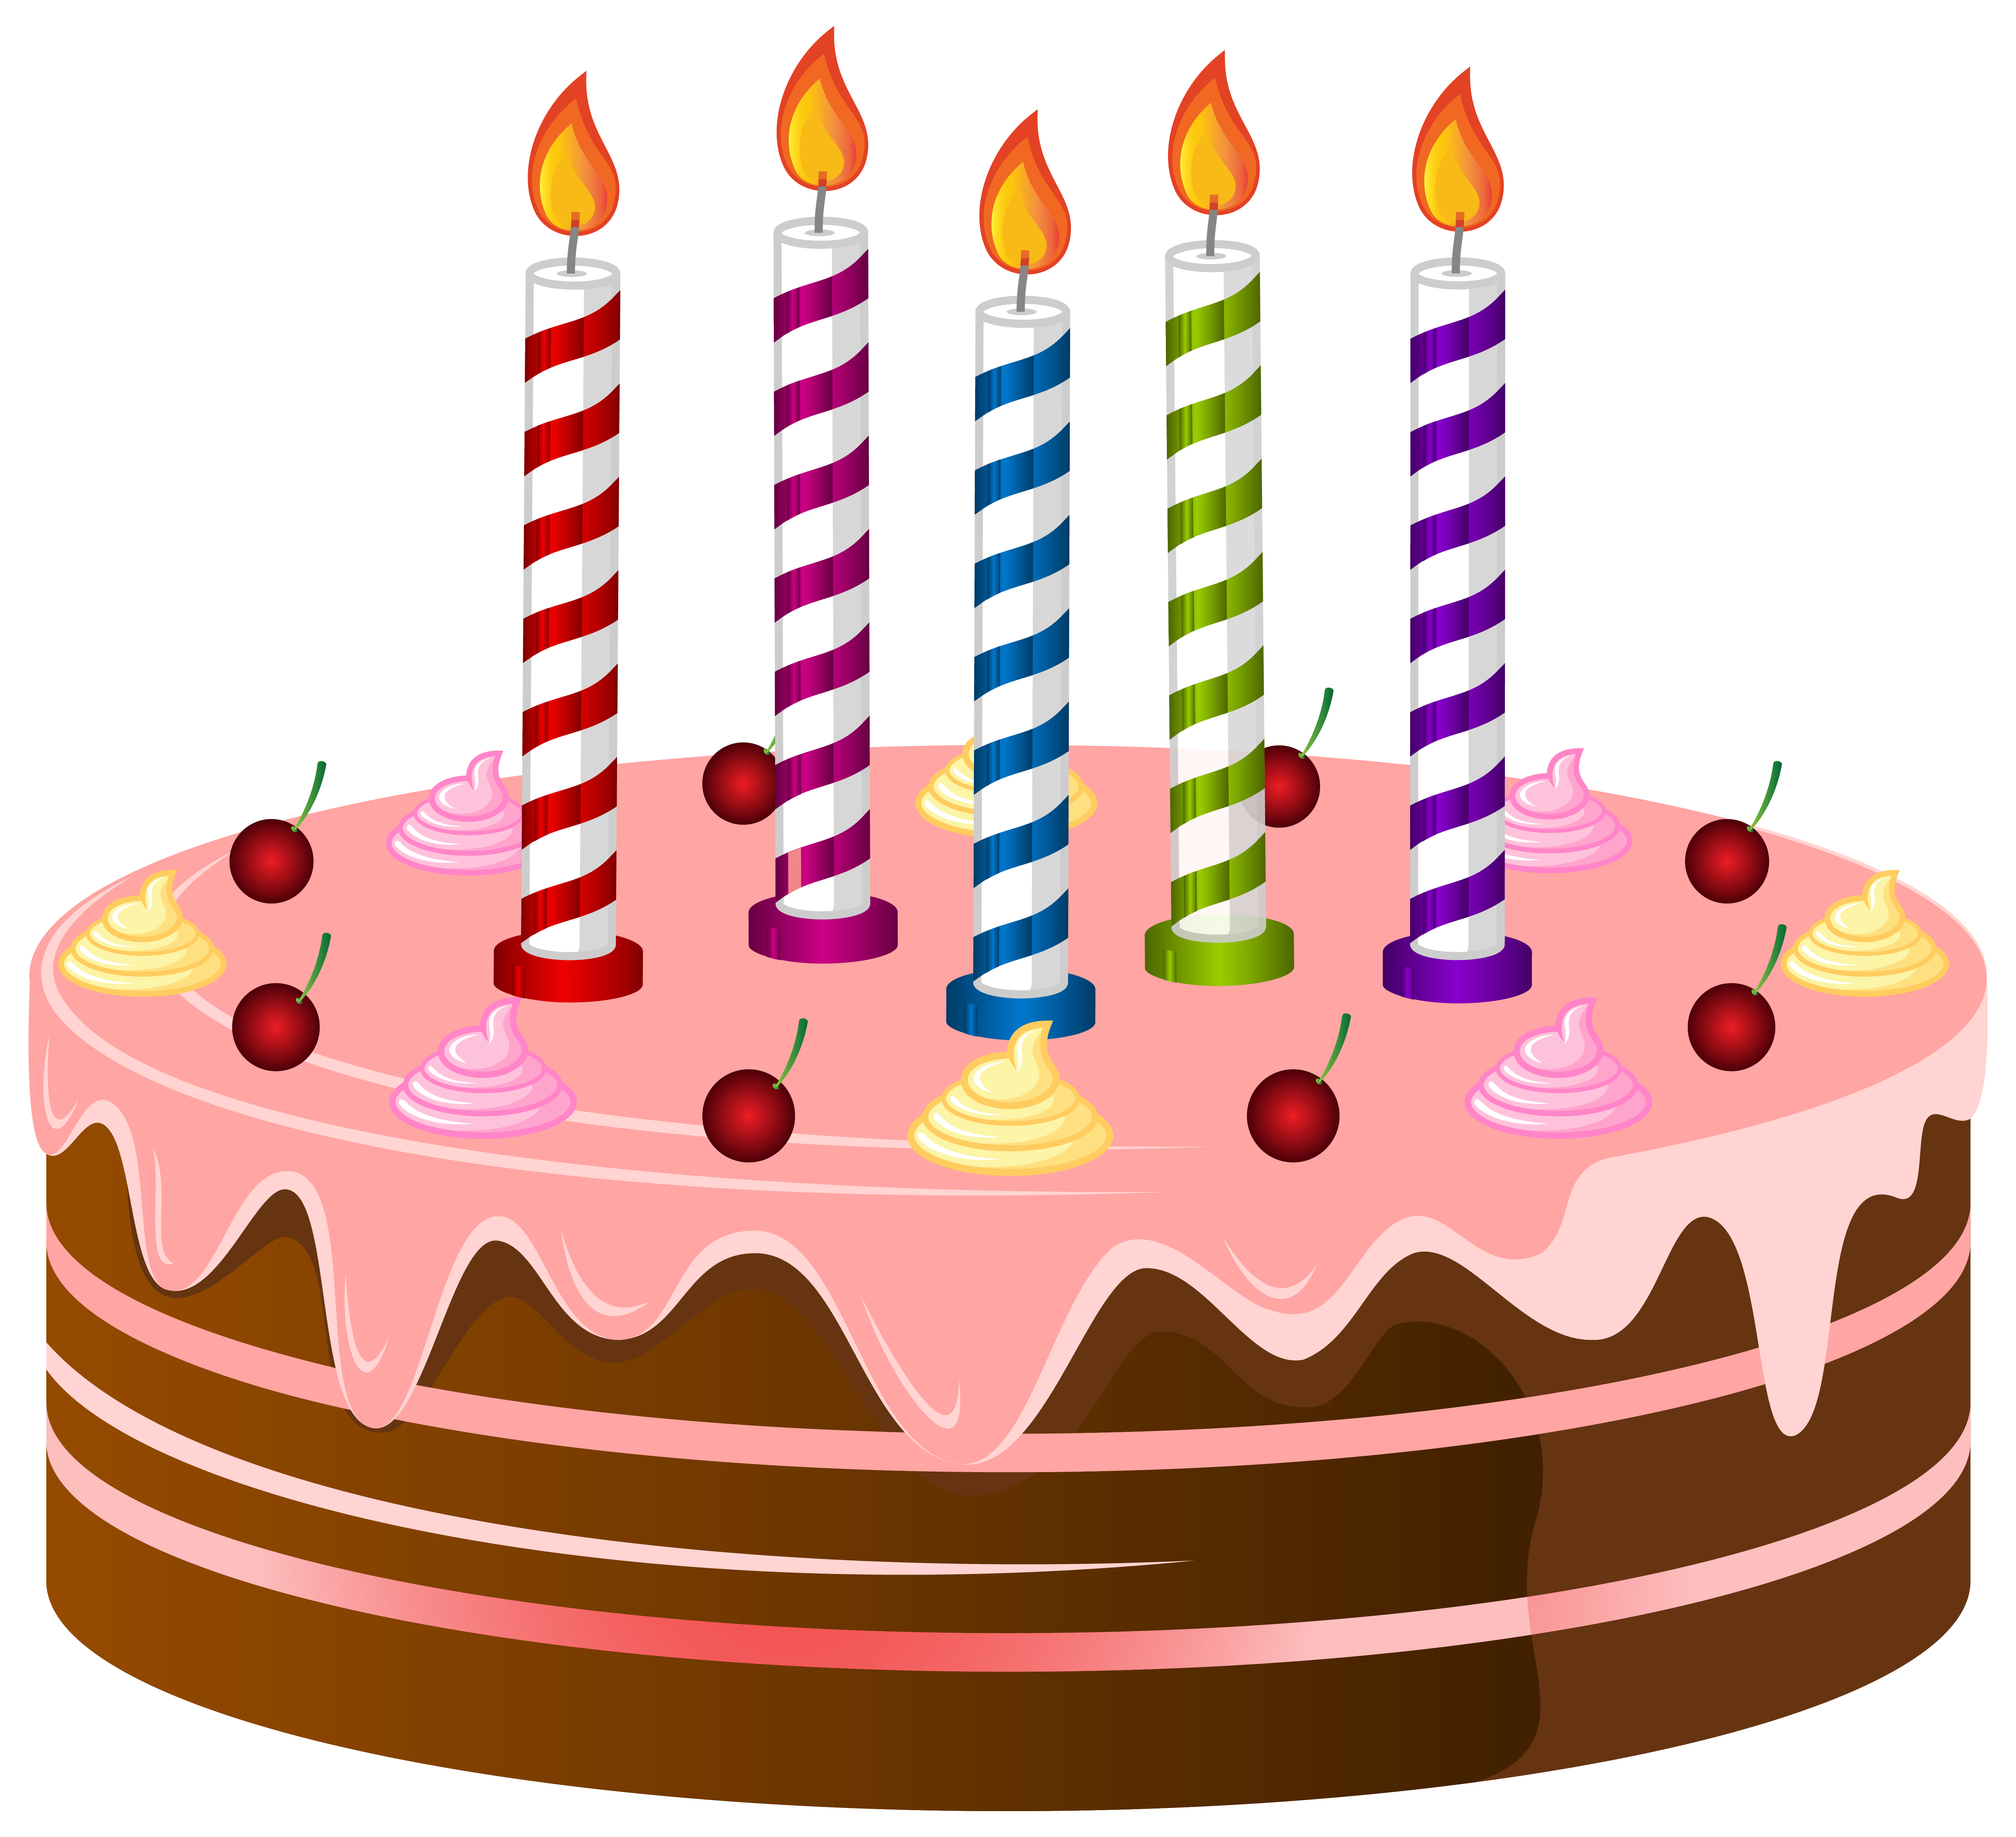 Birthday Cake Clip Art Image-Birthday cake clip art image-9